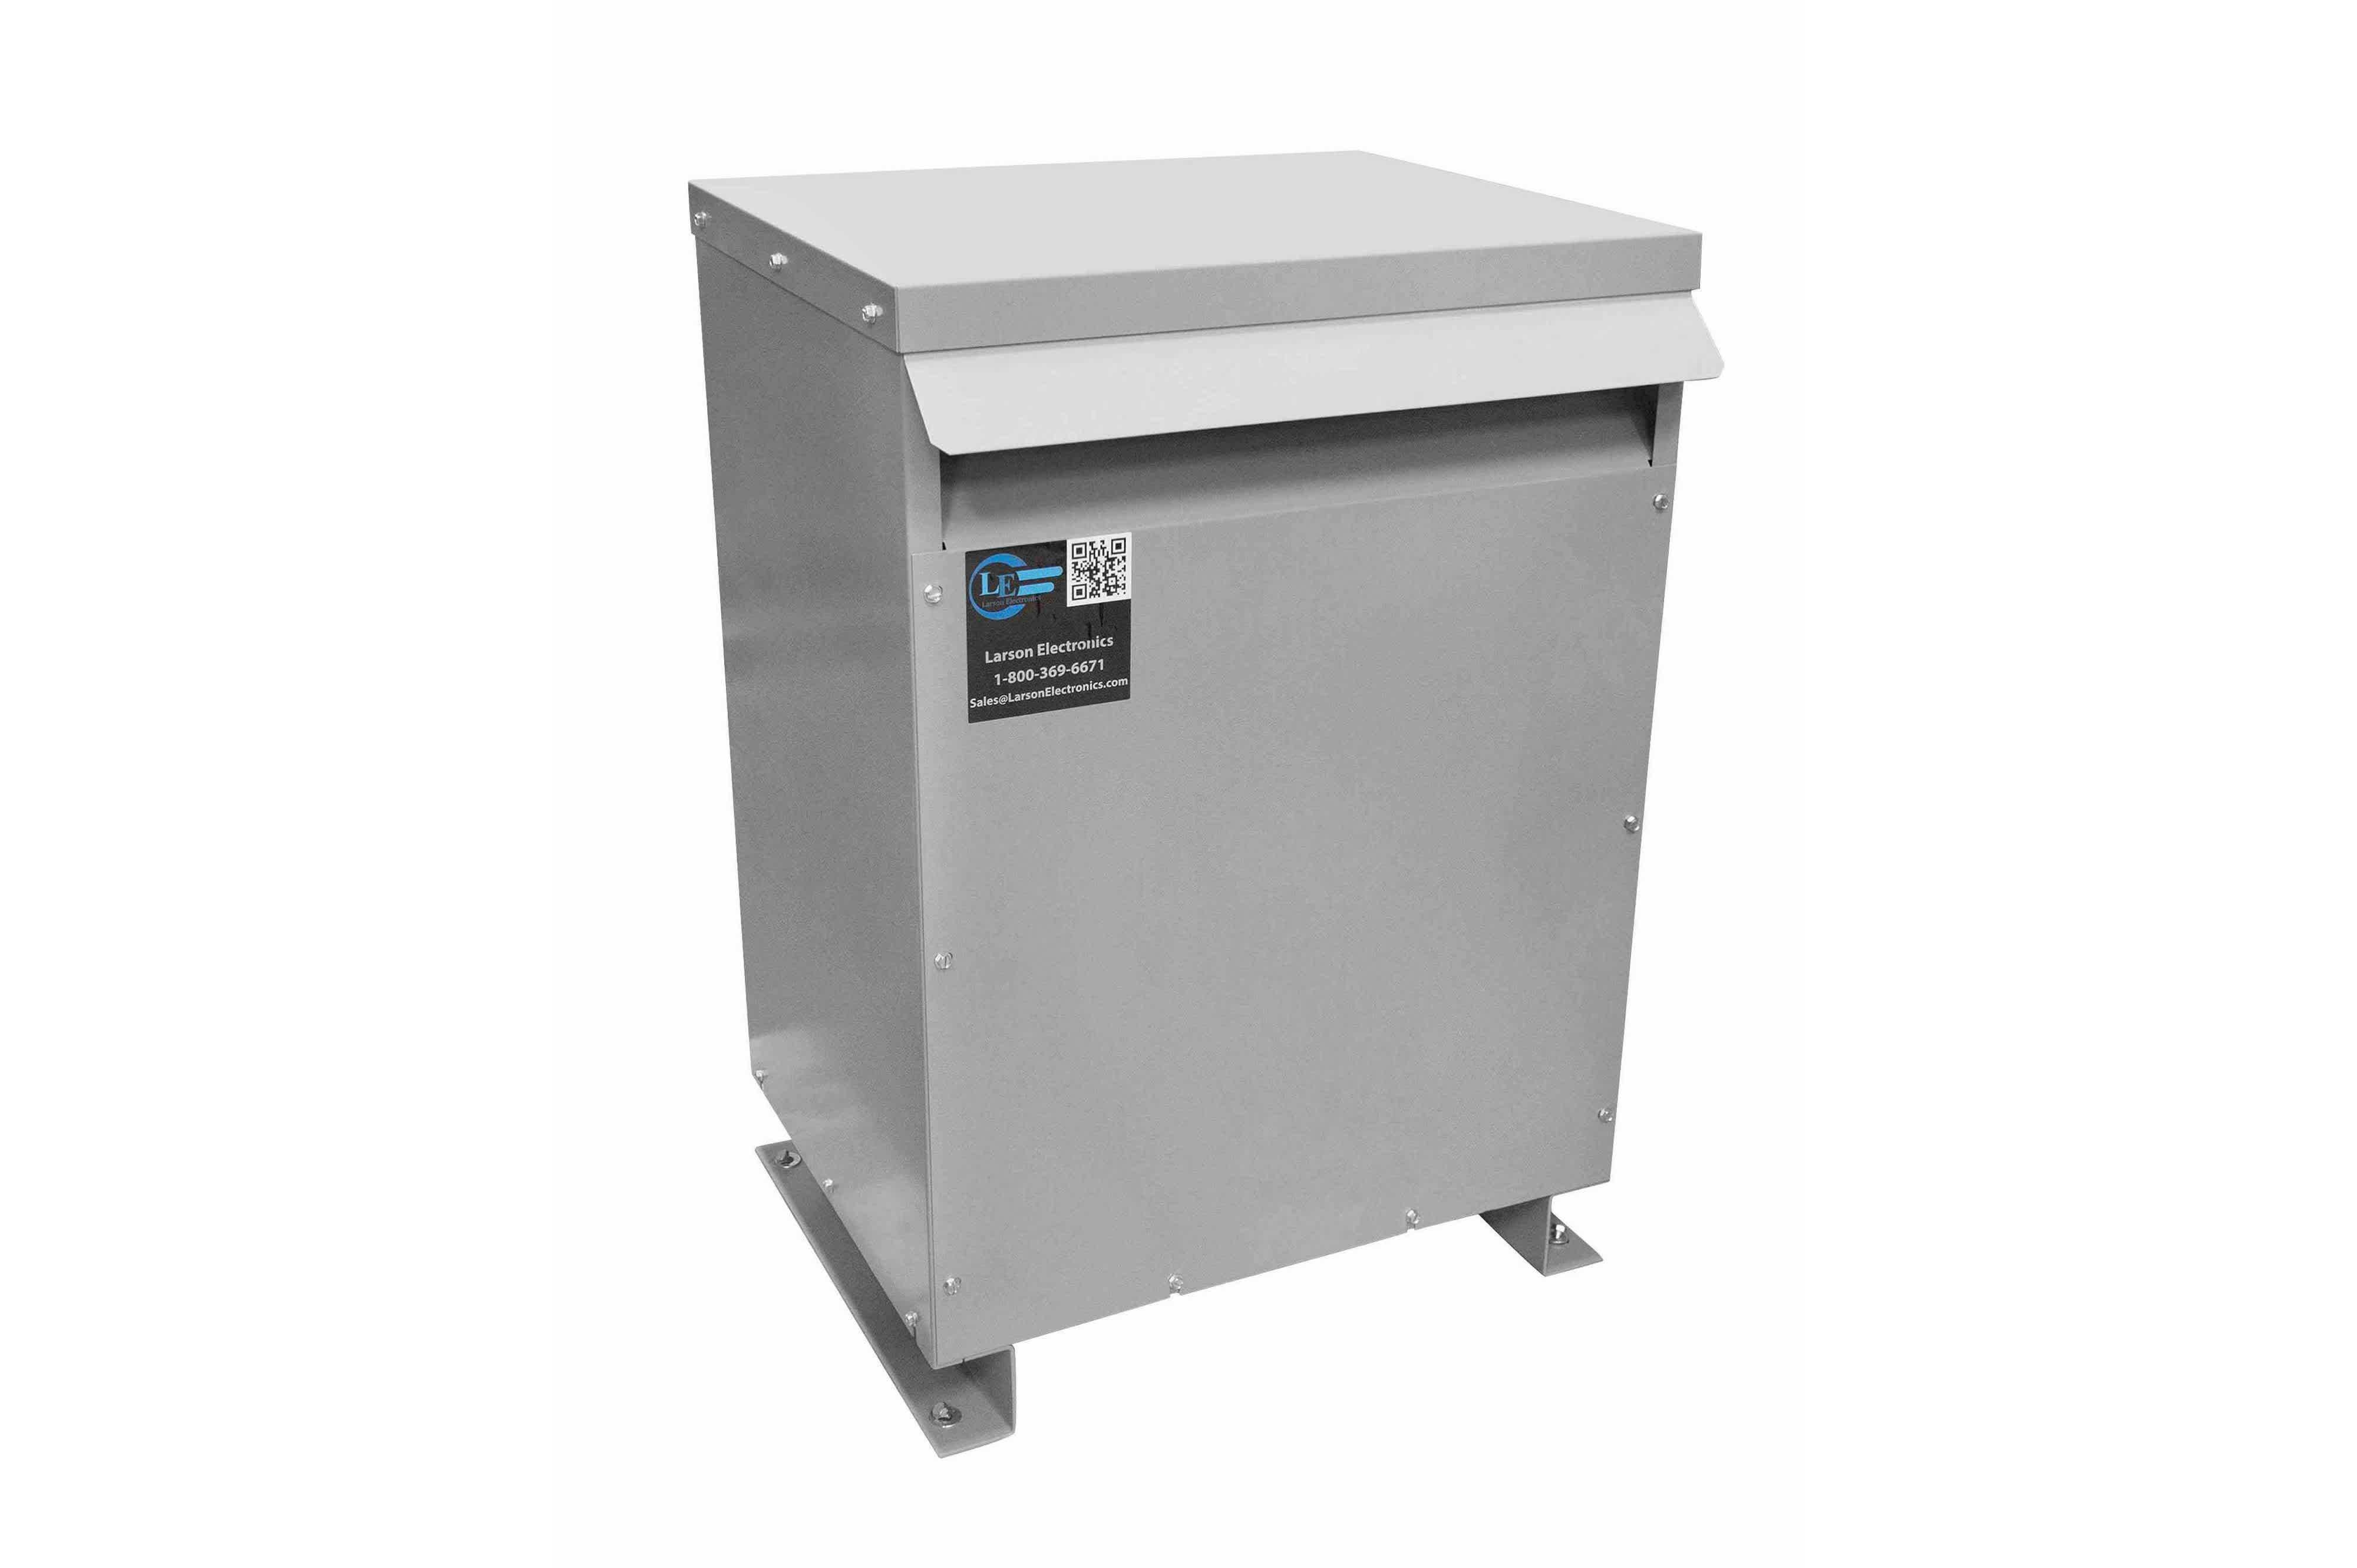 55 kVA 3PH Isolation Transformer, 460V Wye Primary, 575V Delta Secondary, N3R, Ventilated, 60 Hz